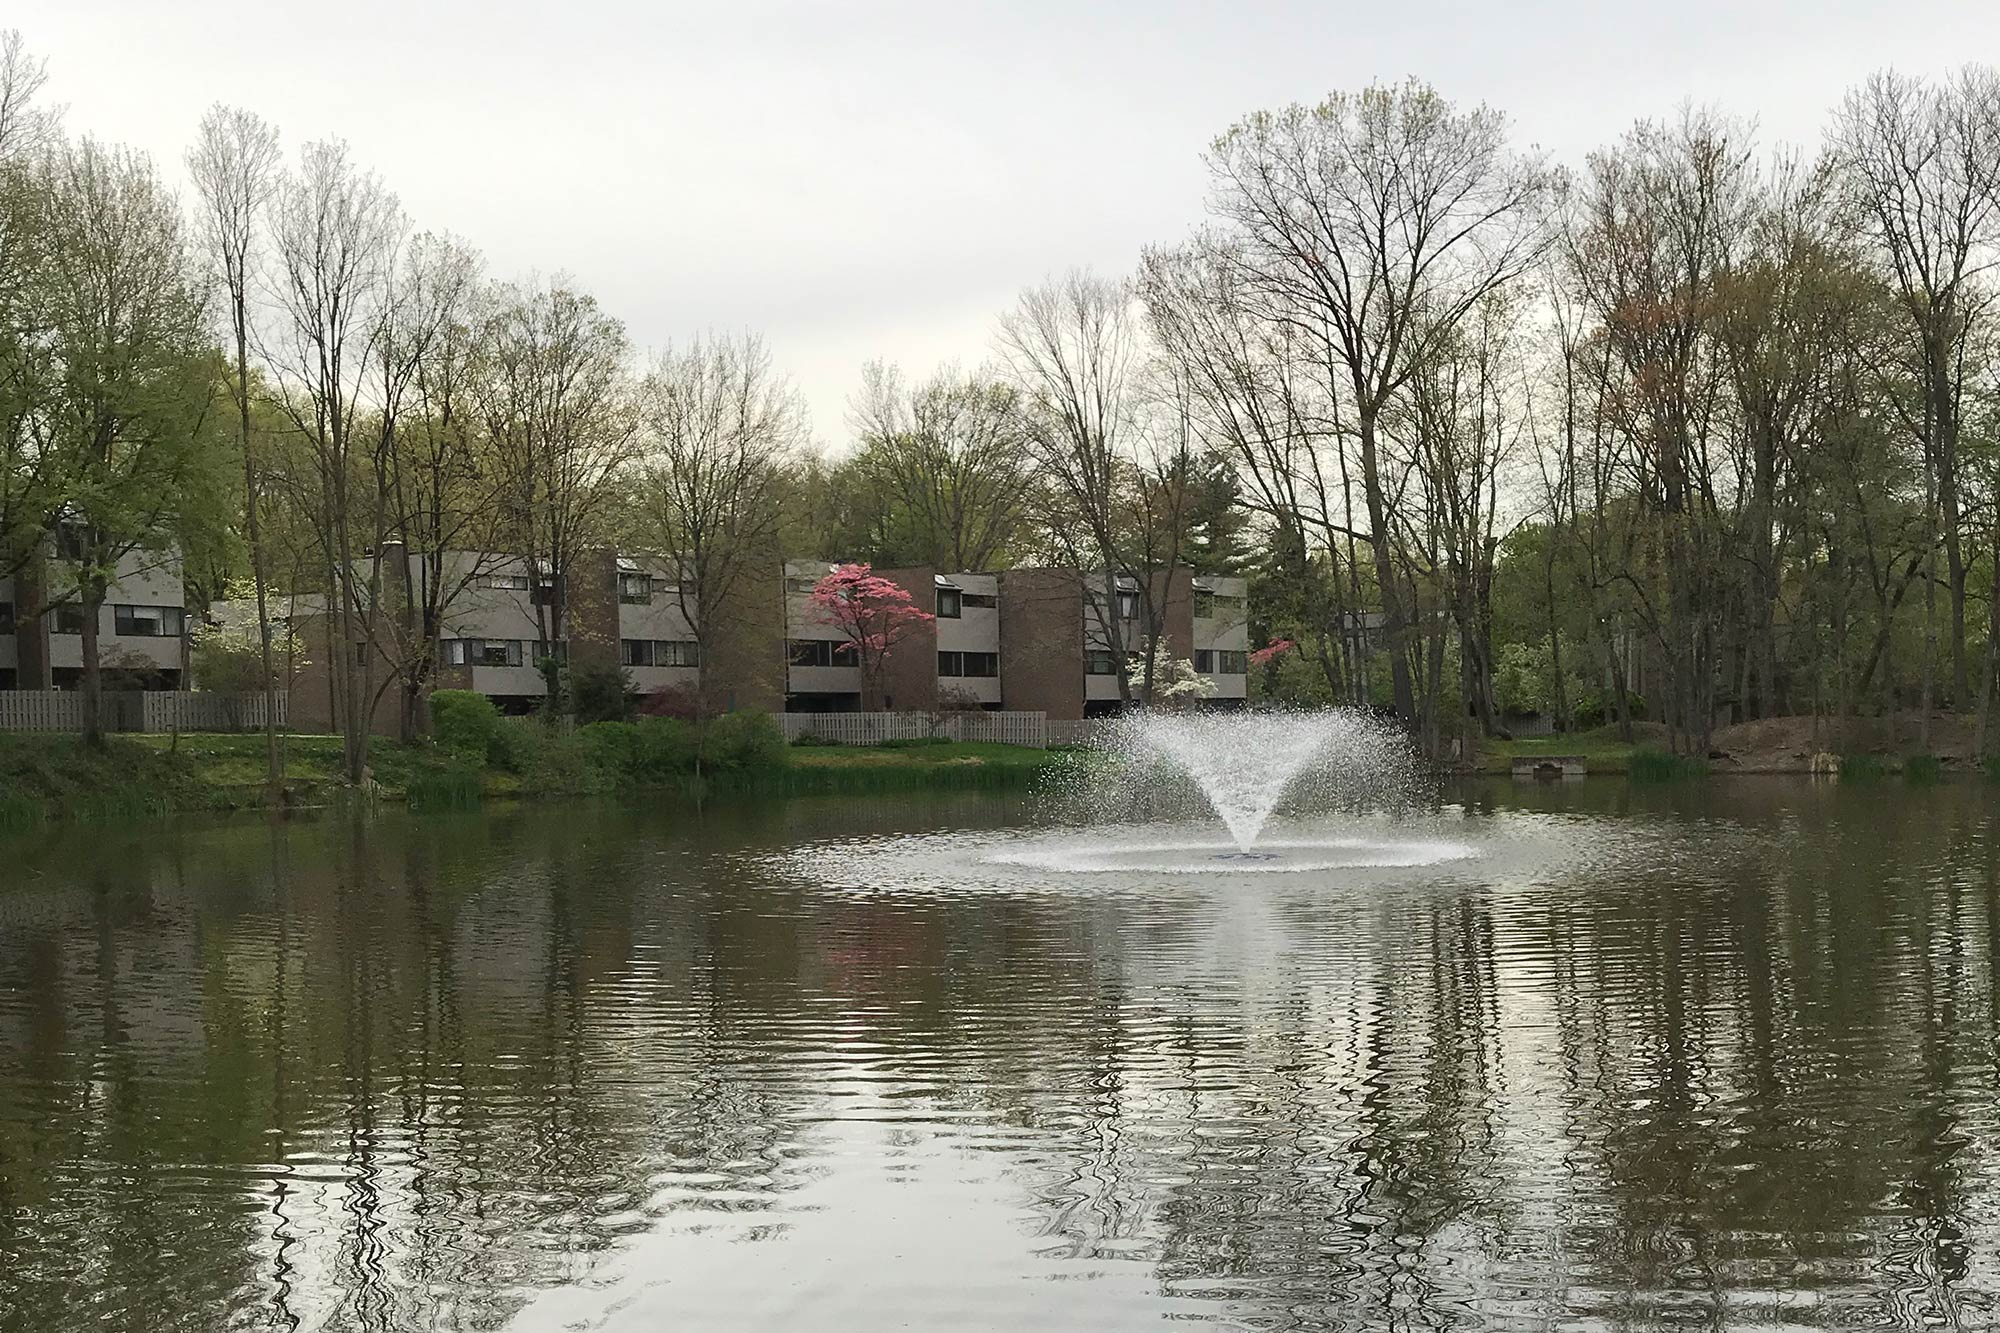 About Washington Pond — Washington Pond Homeowners Association